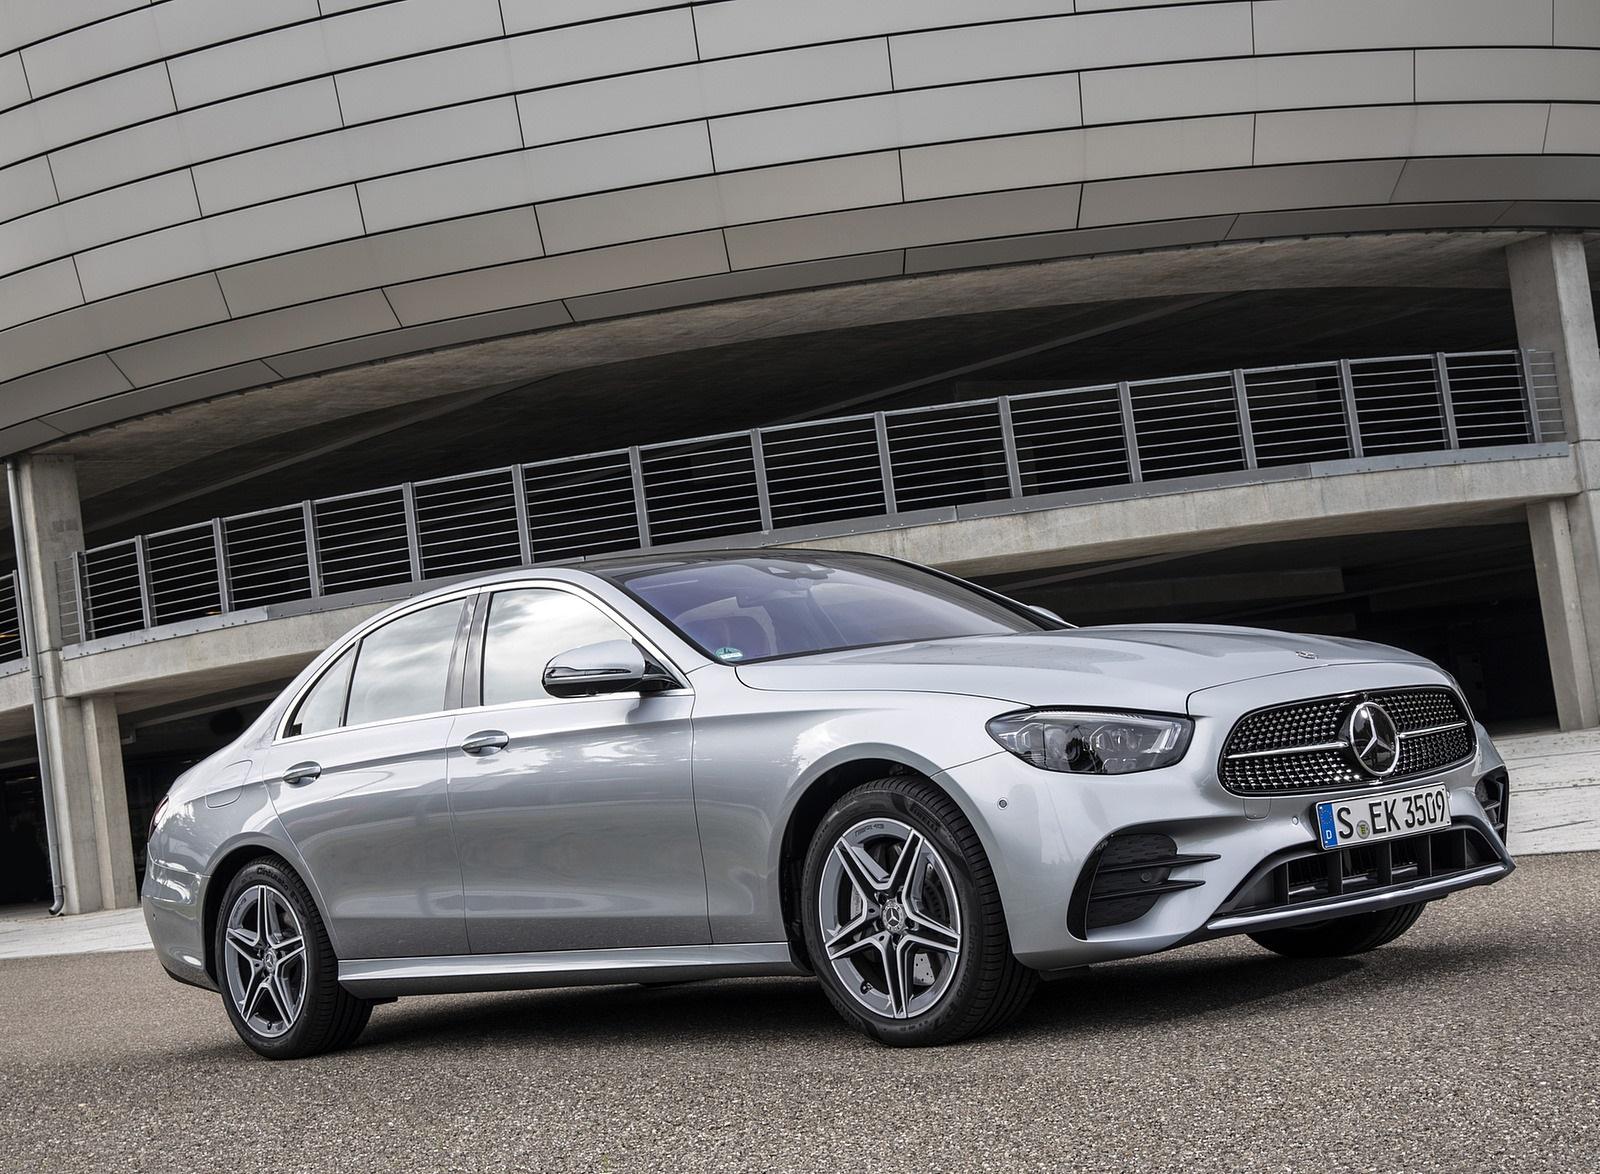 2021 Mercedes-Benz E 350 (Color: Hightech silver) Front Three-Quarter Wallpapers (9)